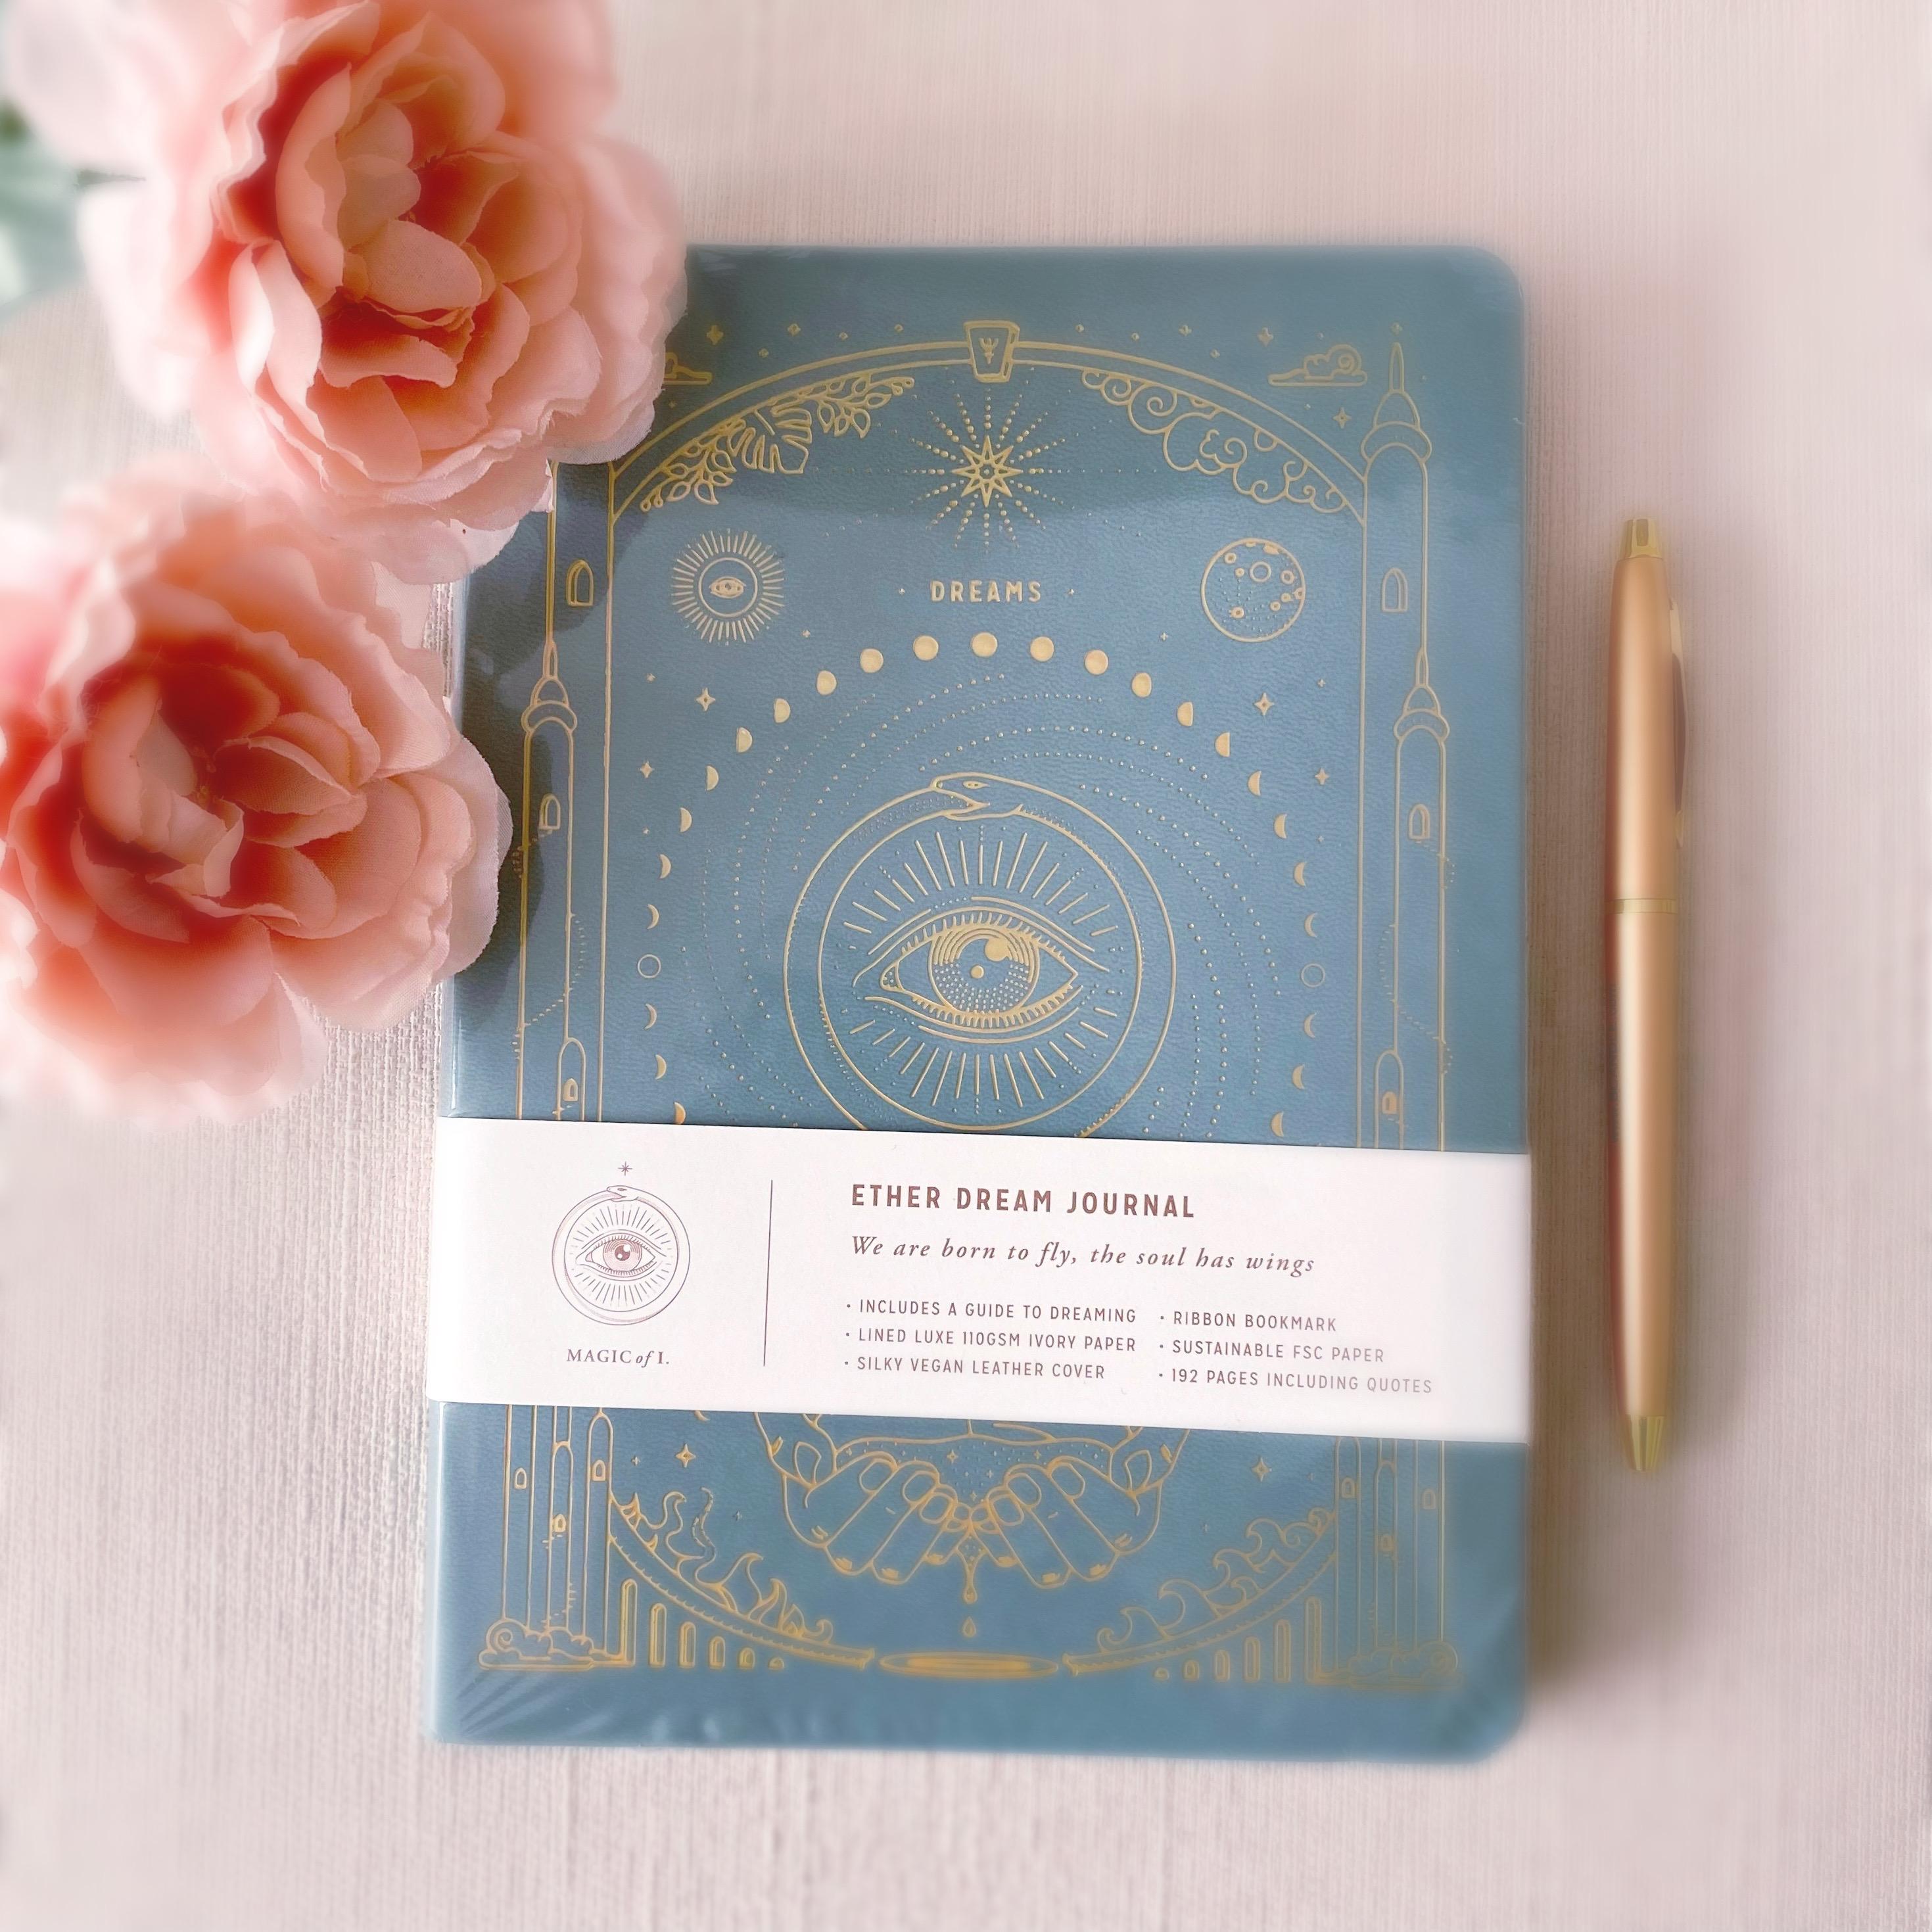 'Magic of I' Dream Journal | Green